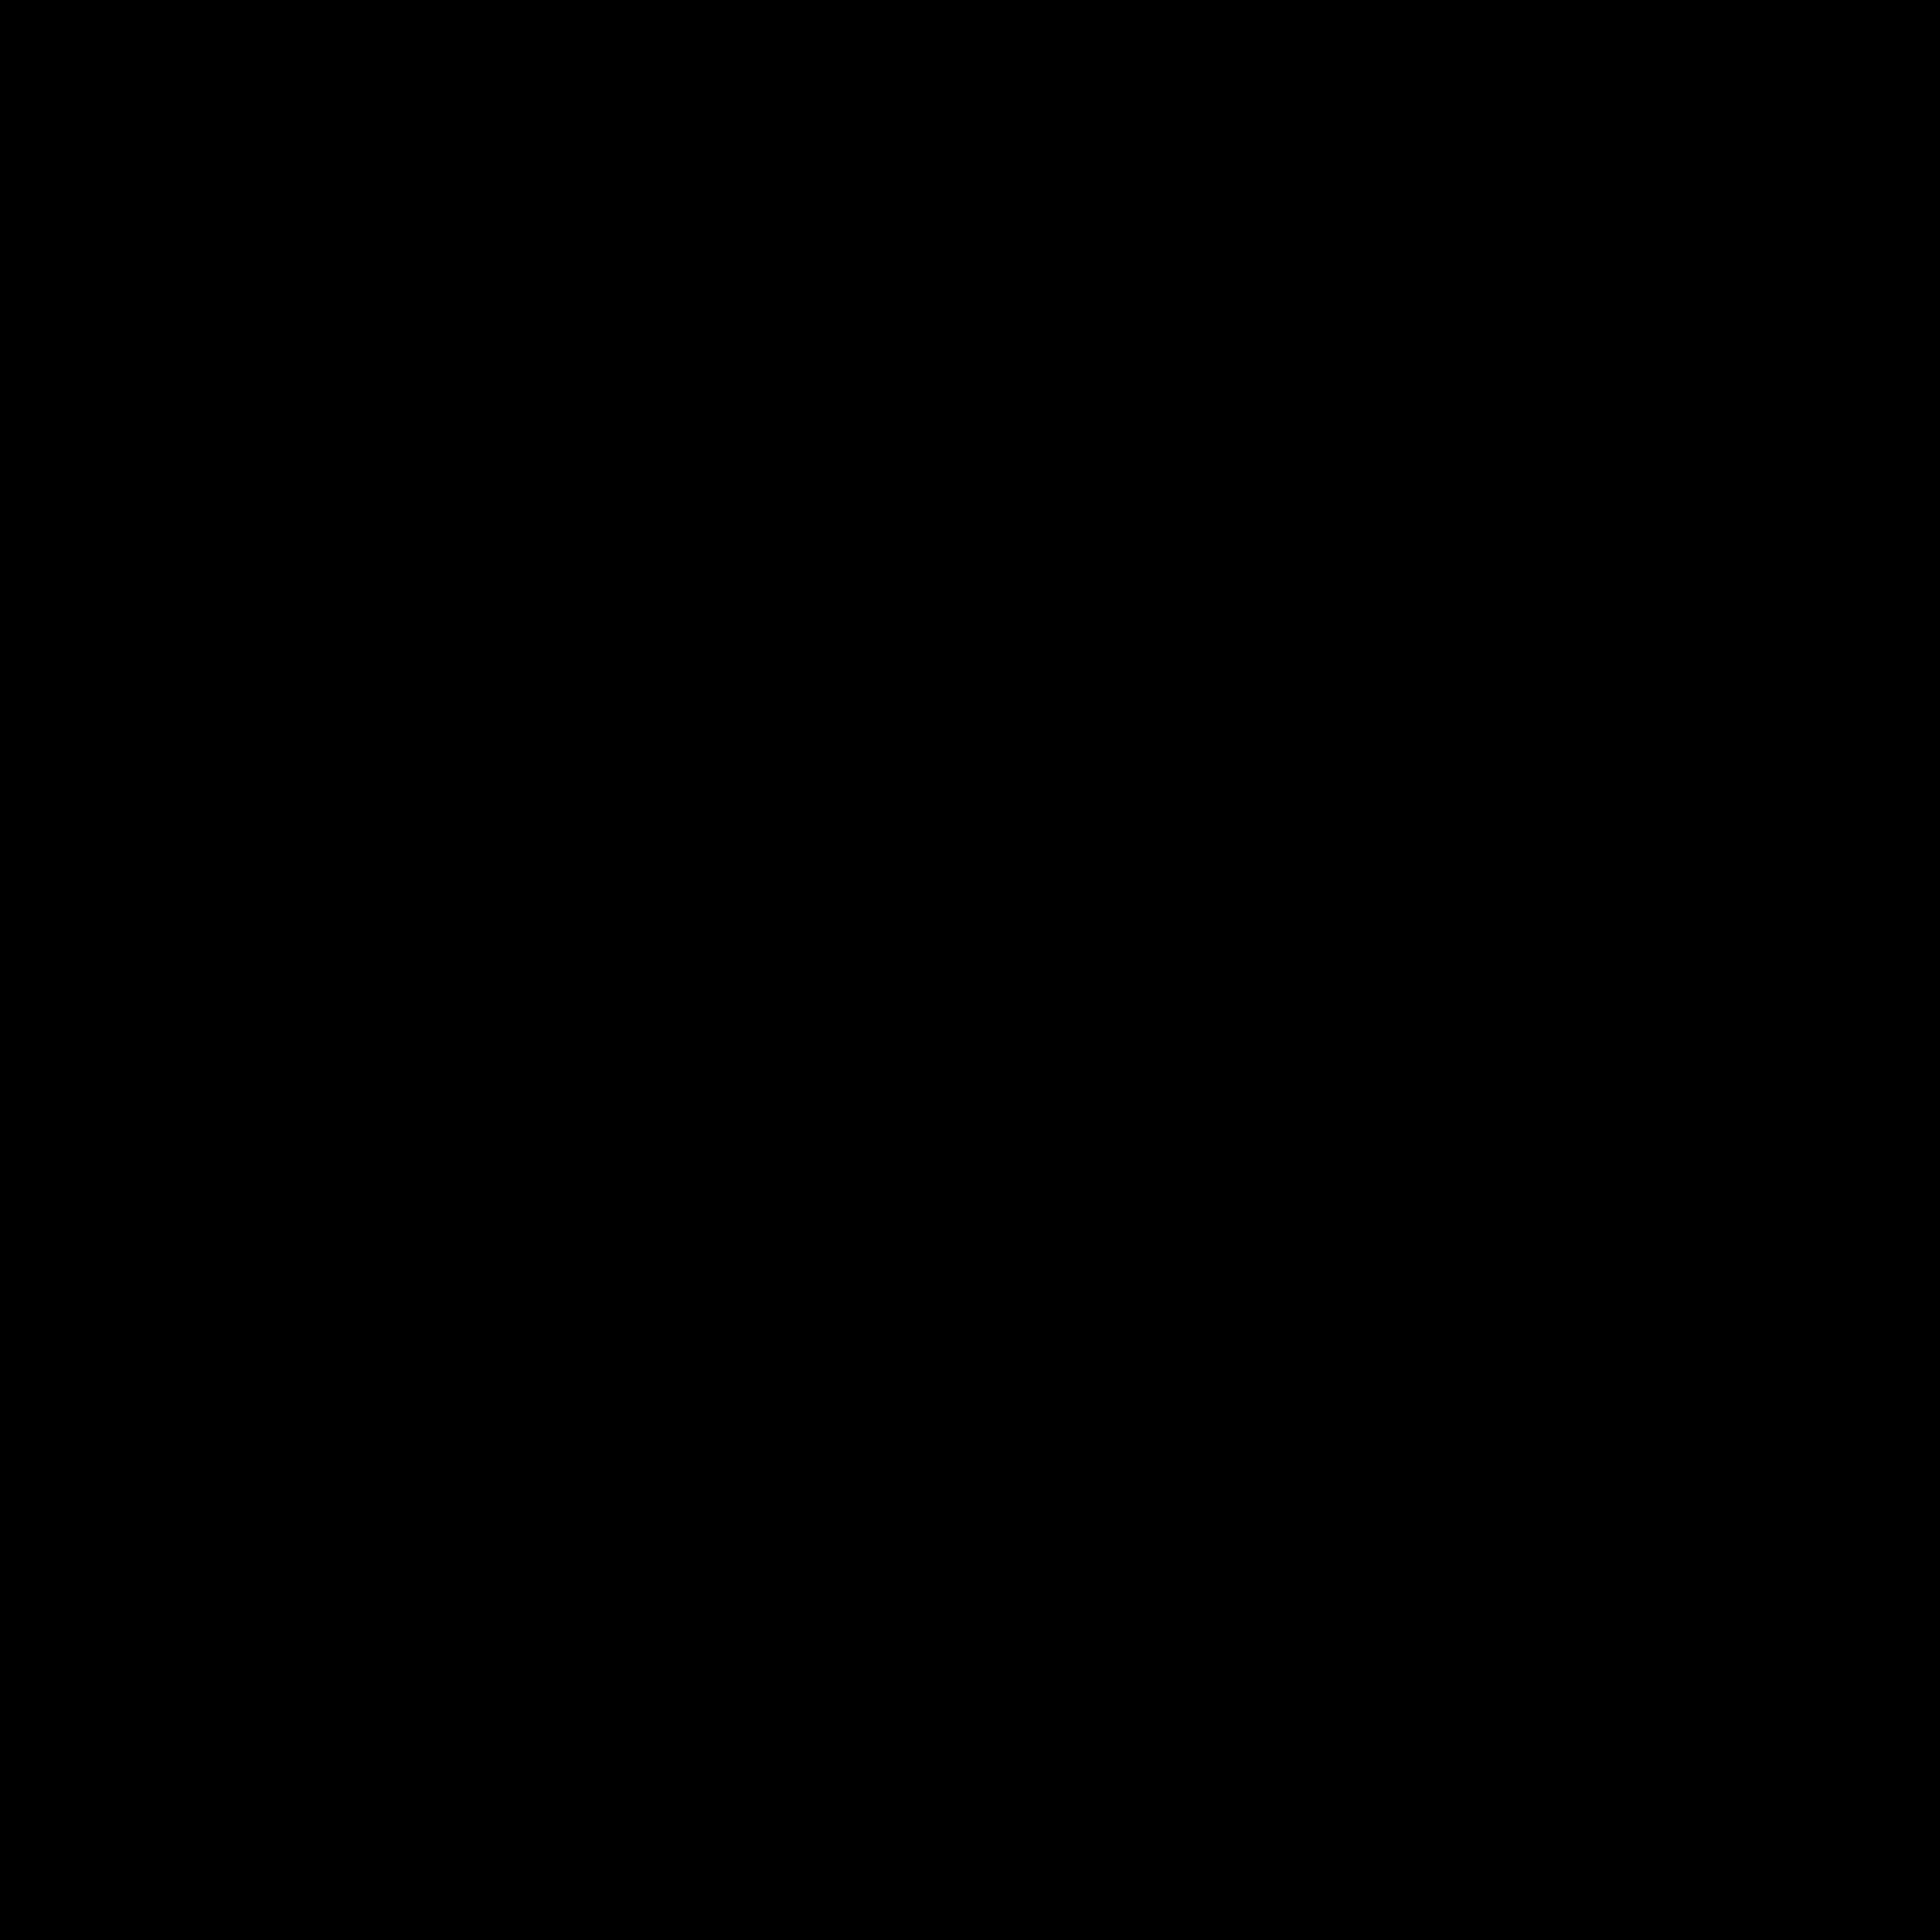 Pfizer Logo PNG Transparent & SVG Vector - Freebie Supply